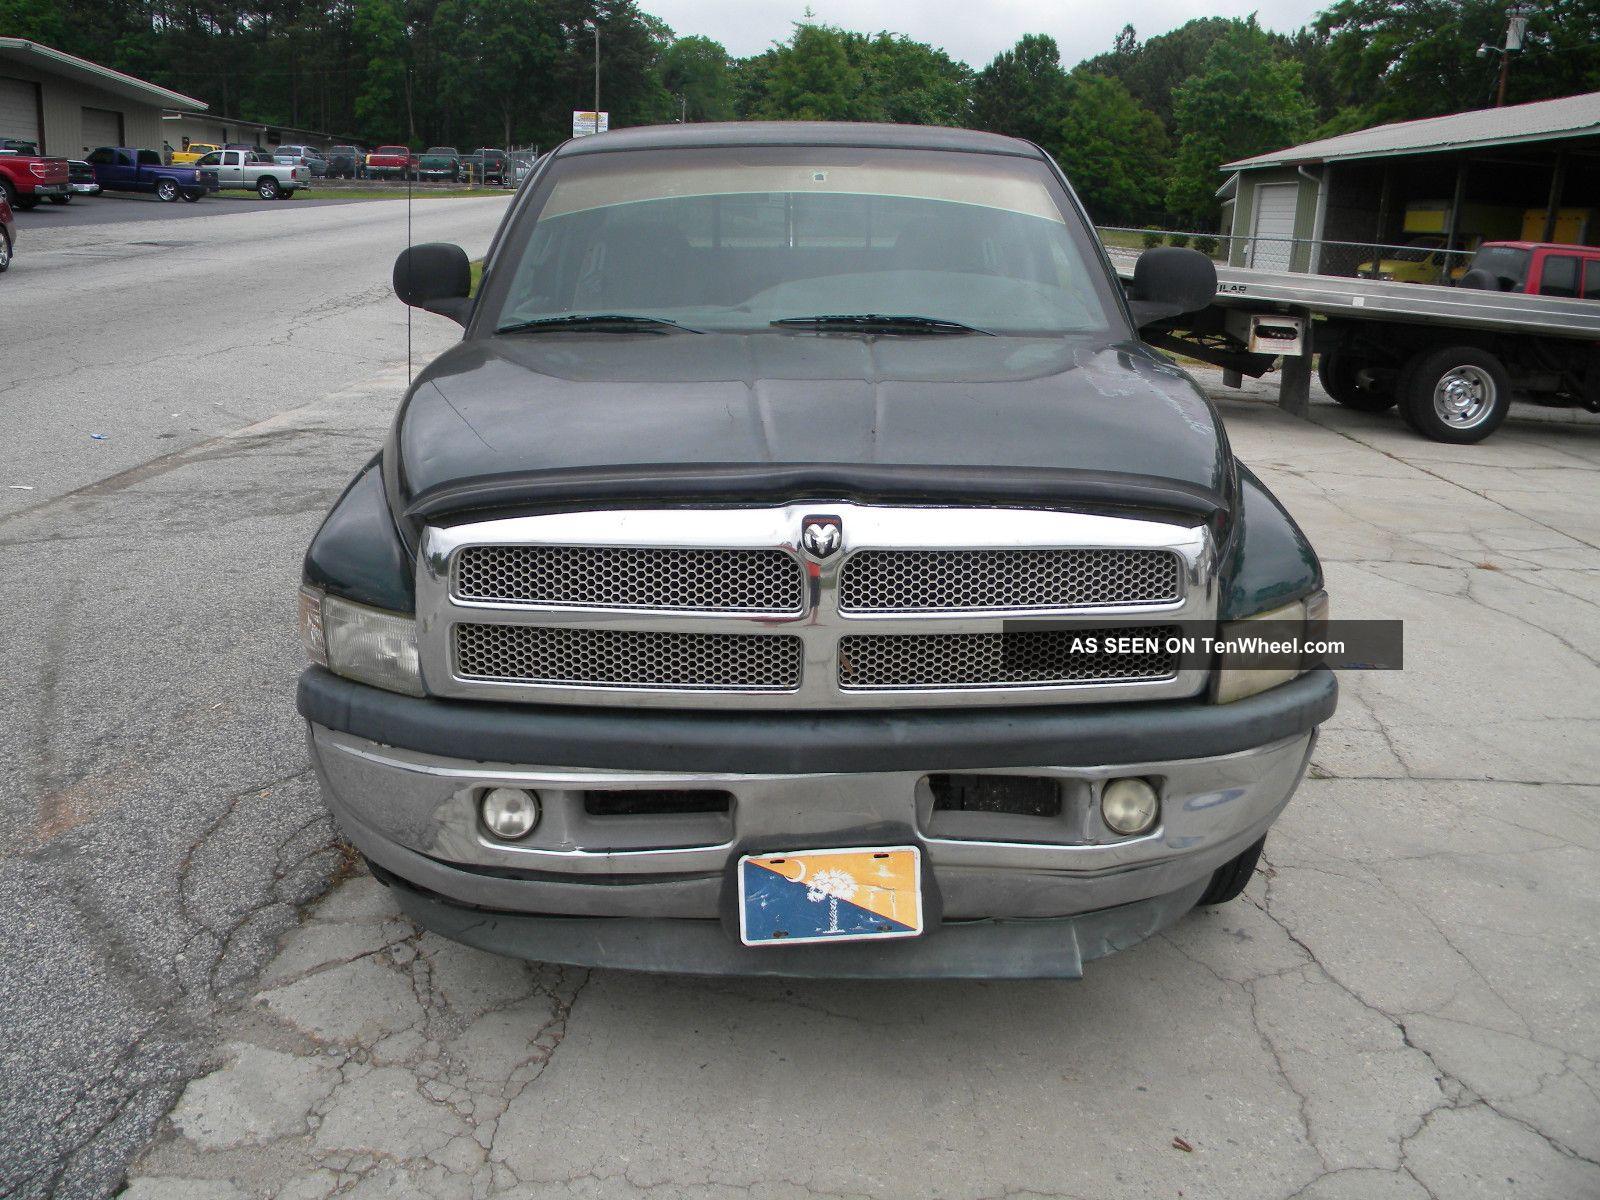 2001 dodge ram 2500 cummins diesel ext cab ram 2500 photo 6. Cars Review. Best American Auto & Cars Review